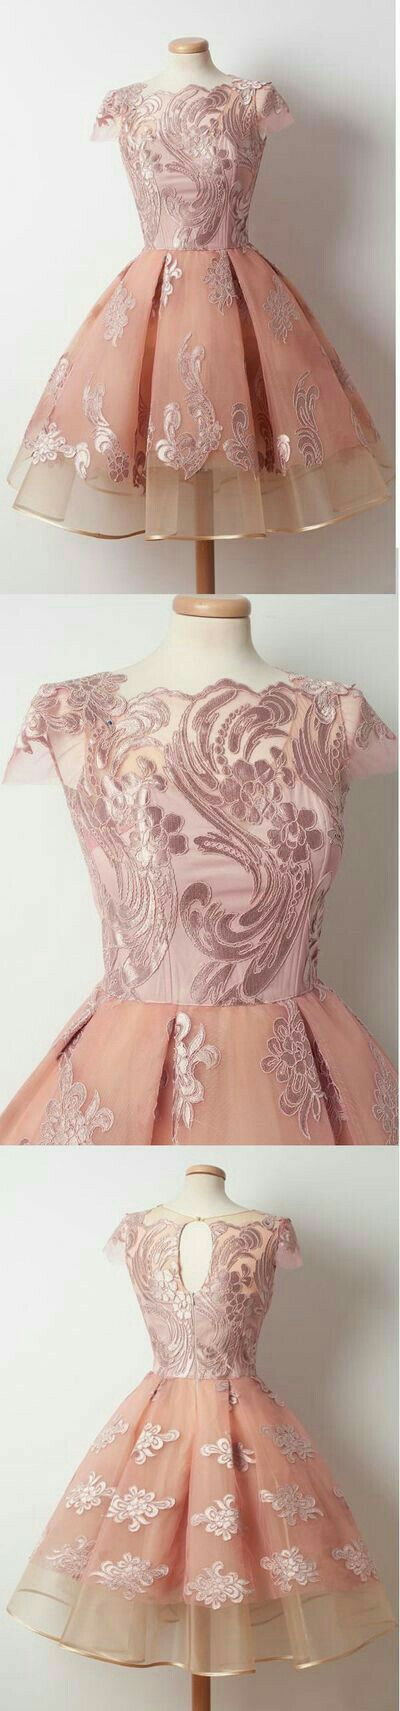 203 mejores imágenes de Vintage 1950s Dresses en Pinterest | Armario ...